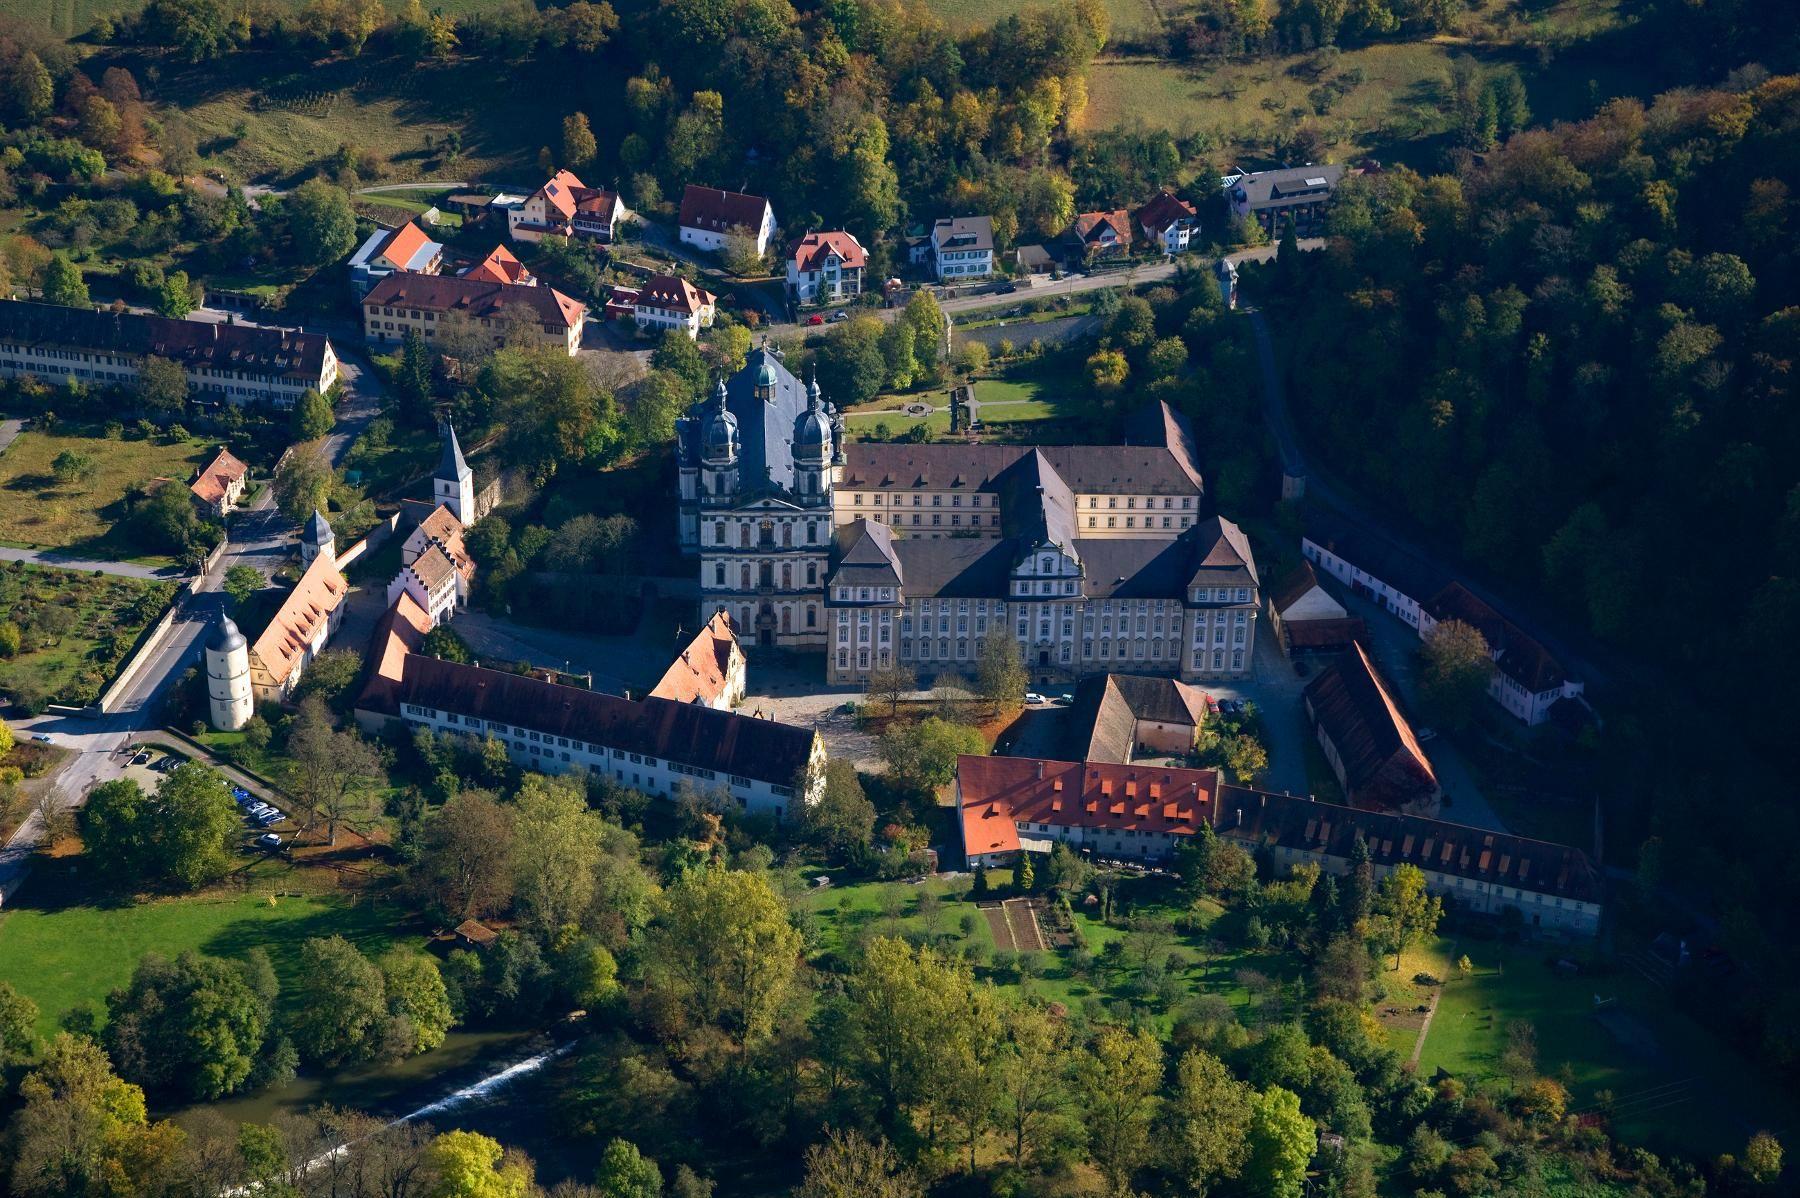 Schöntal Monastery, Aerial view